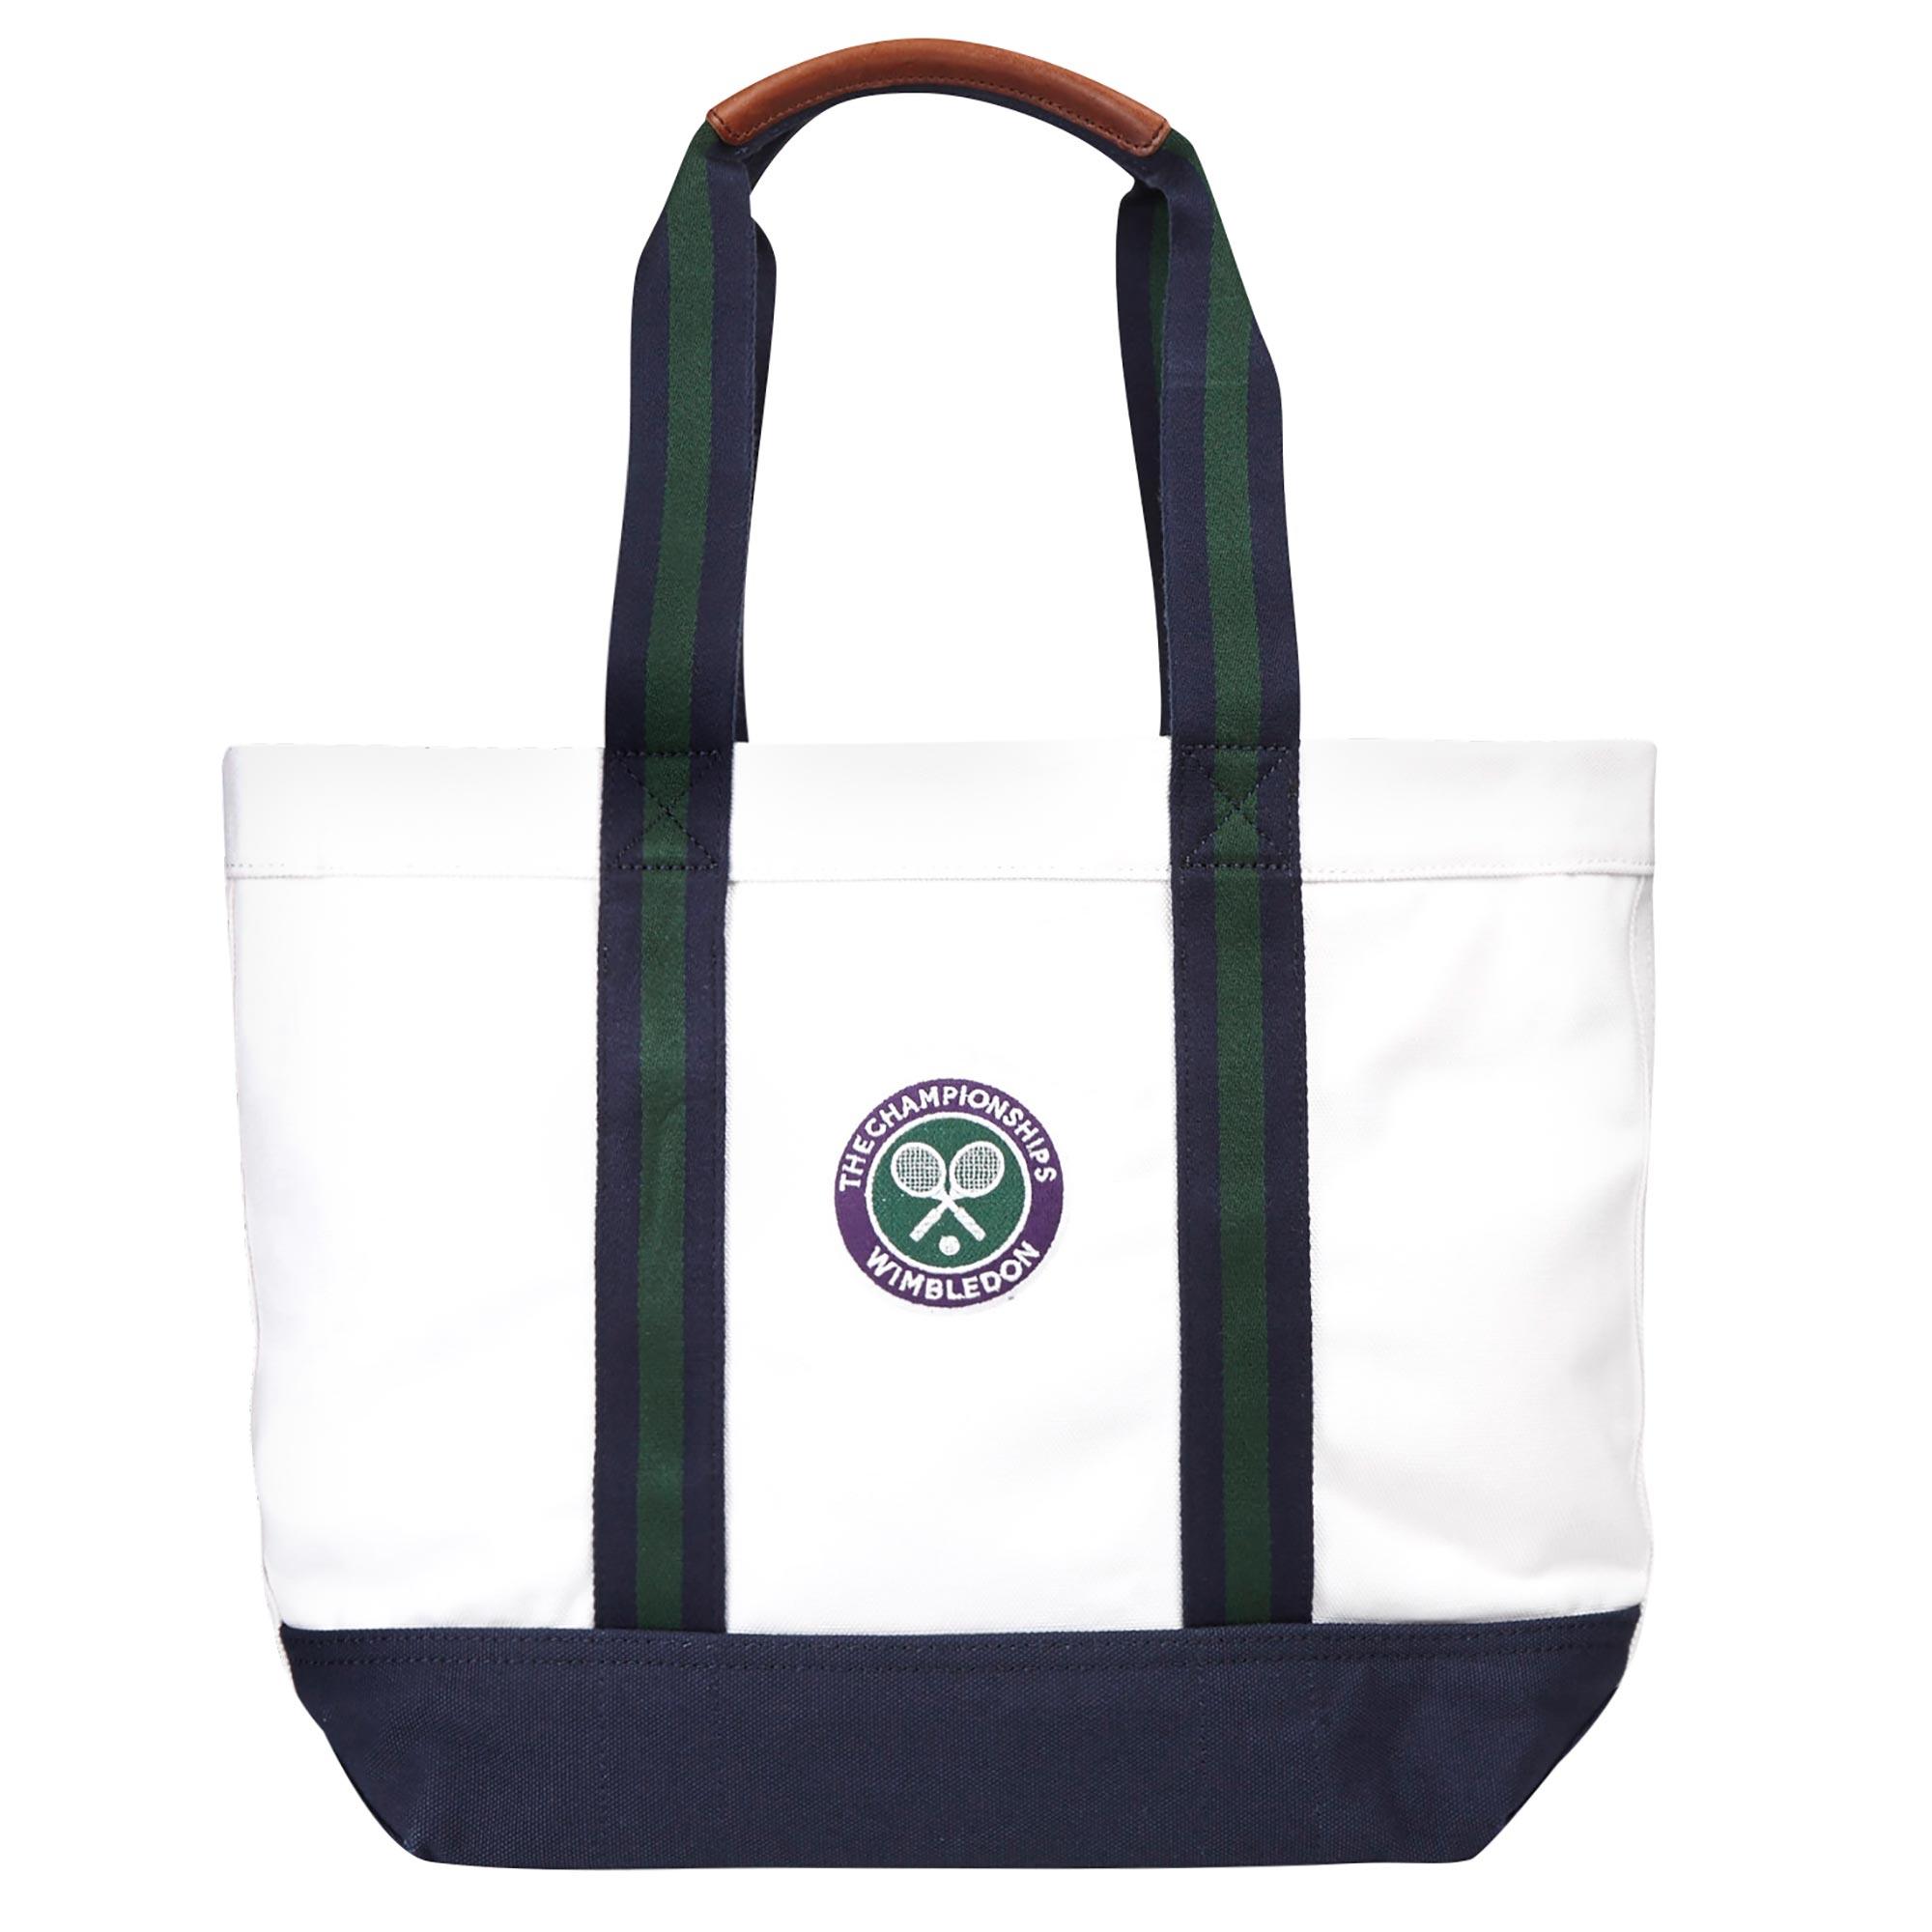 Wimbledon Ralph Lauren Tote Bag - White